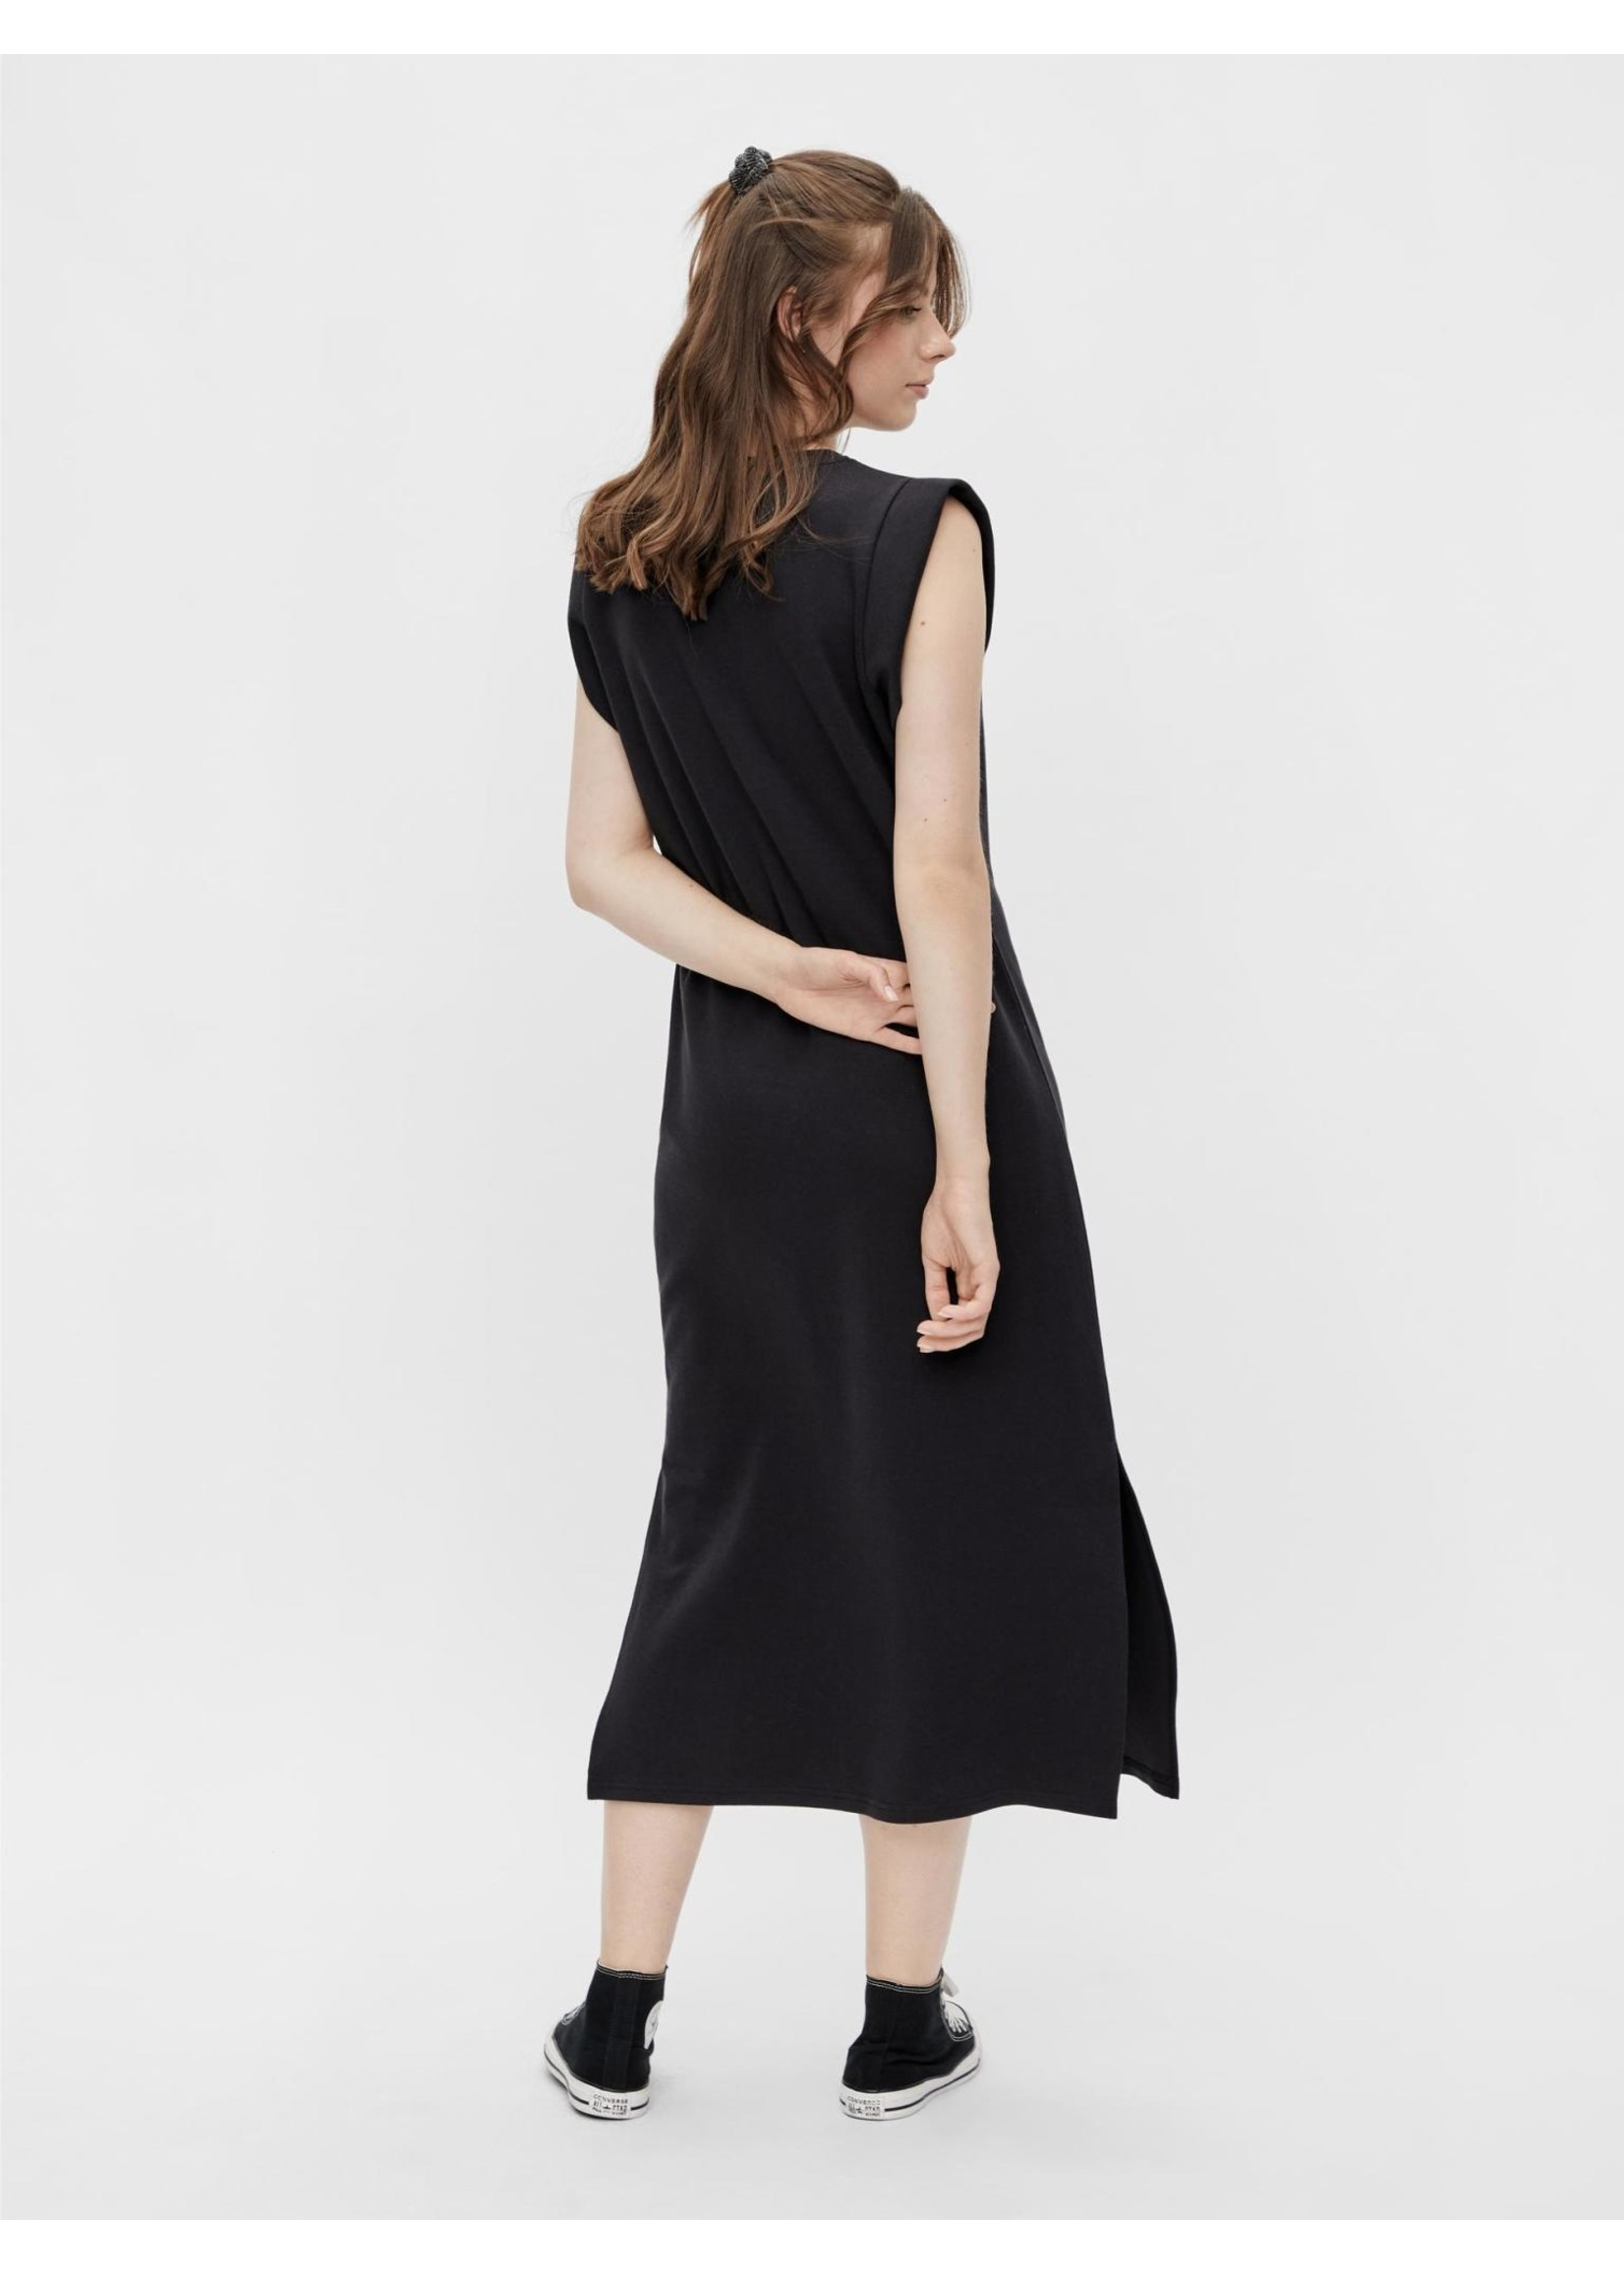 PIECES TEMMO SL  ANKLE DRESS,black